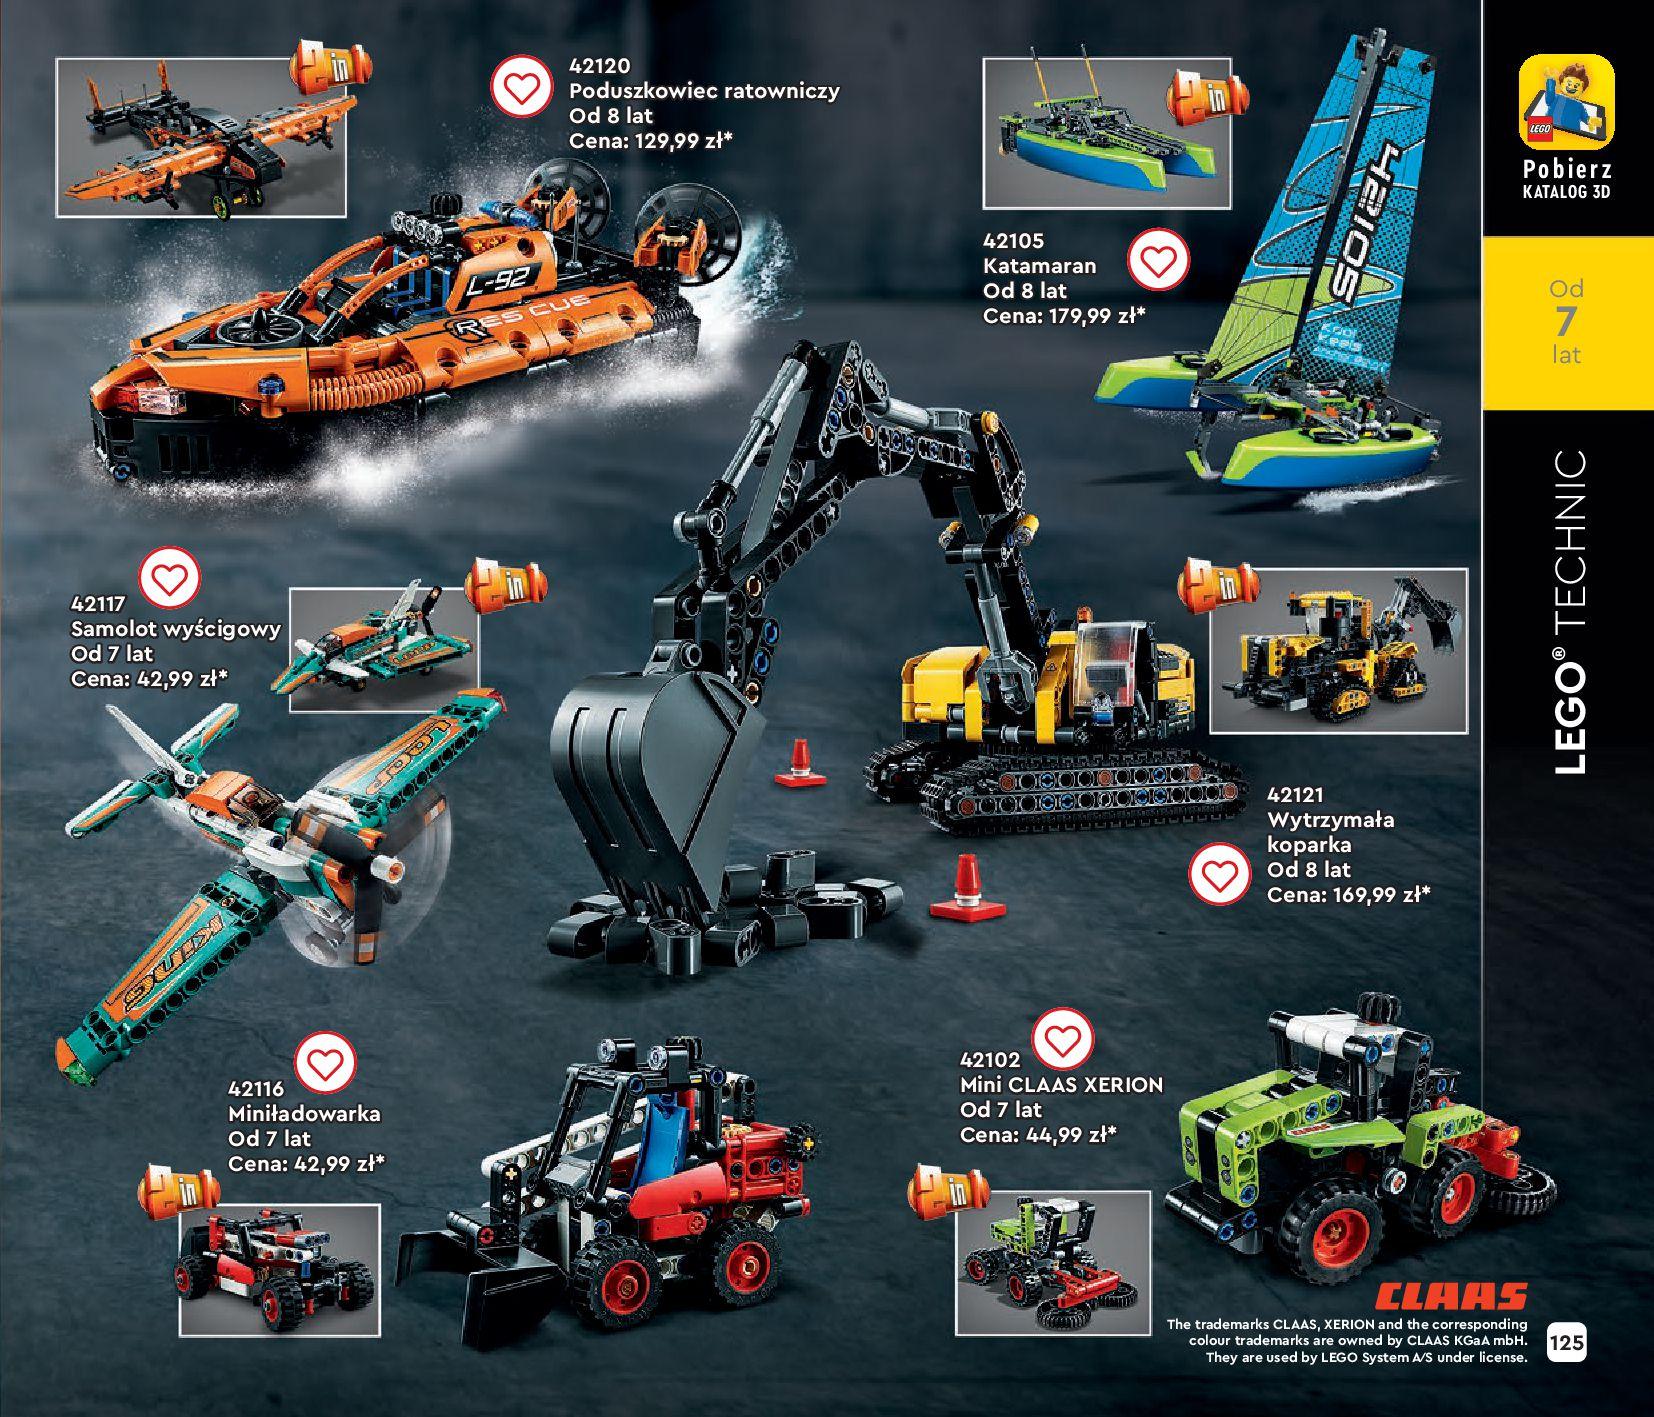 Gazetka LEGO: Gazetka LEGO - katalog 2021-06-30 page-125